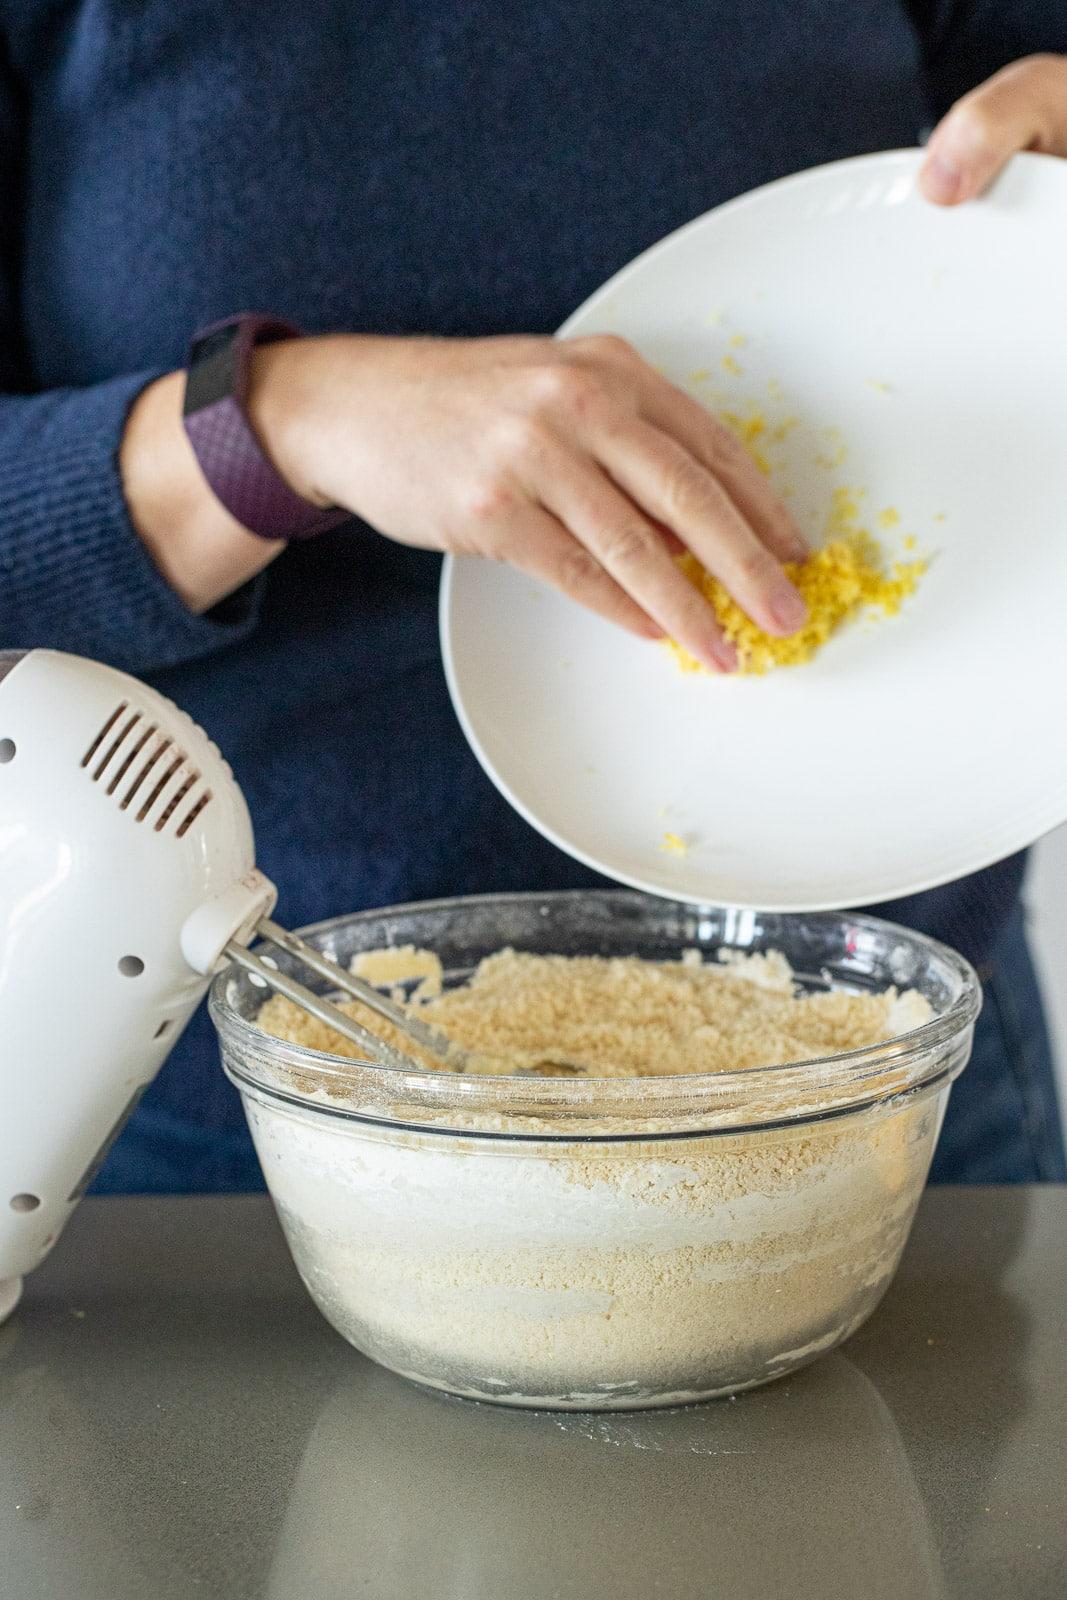 woman adding lemon zest to cookie batter